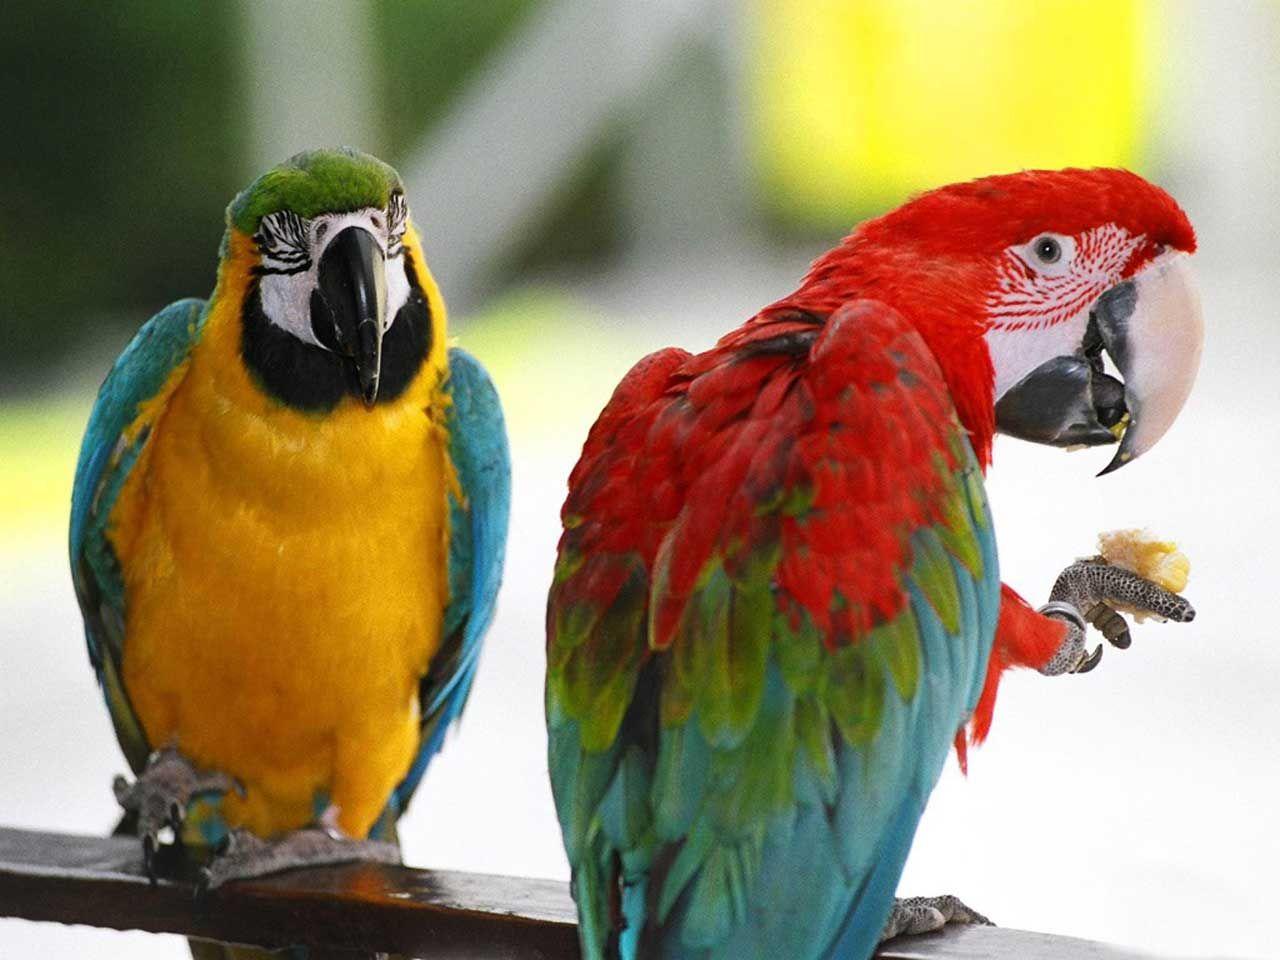 Birds parrots hd wallpapers backgrounds wallpaper 1280943 birds parrots hd wallpapers backgrounds wallpaper 1280943 parrots pictures wallpapers 55 wallpapers voltagebd Images